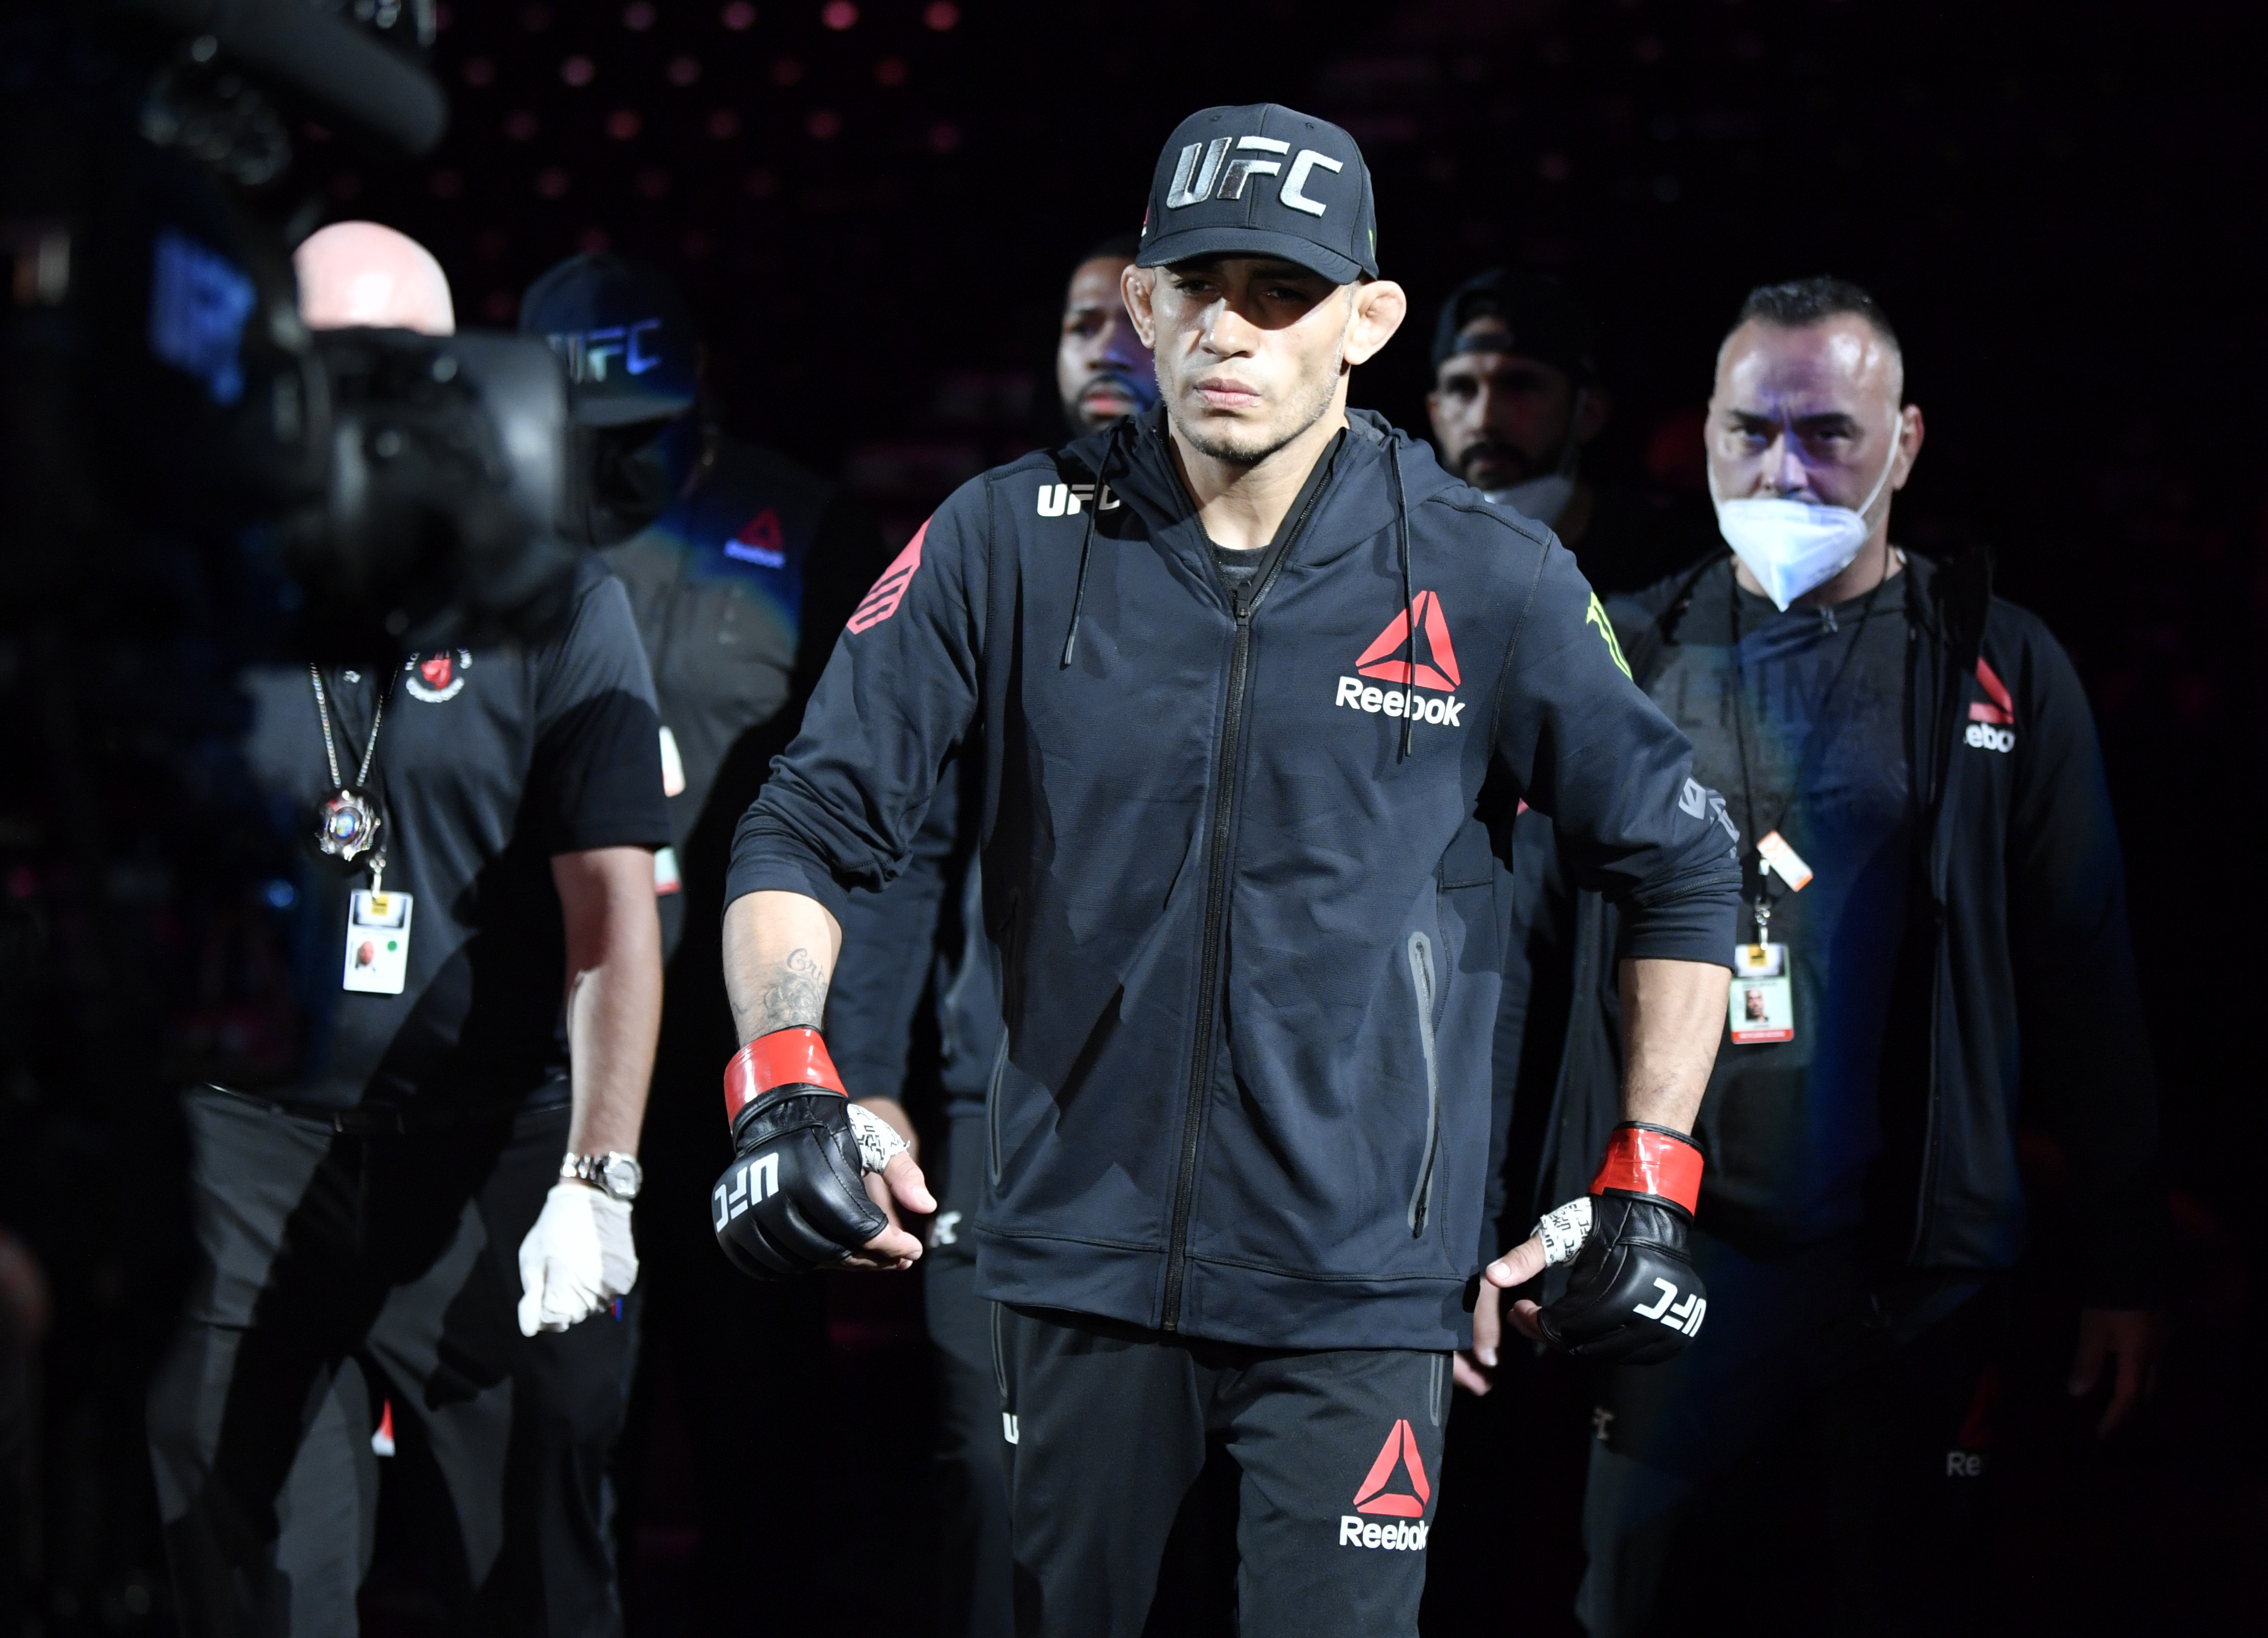 UFC fighter Tony Ferguson